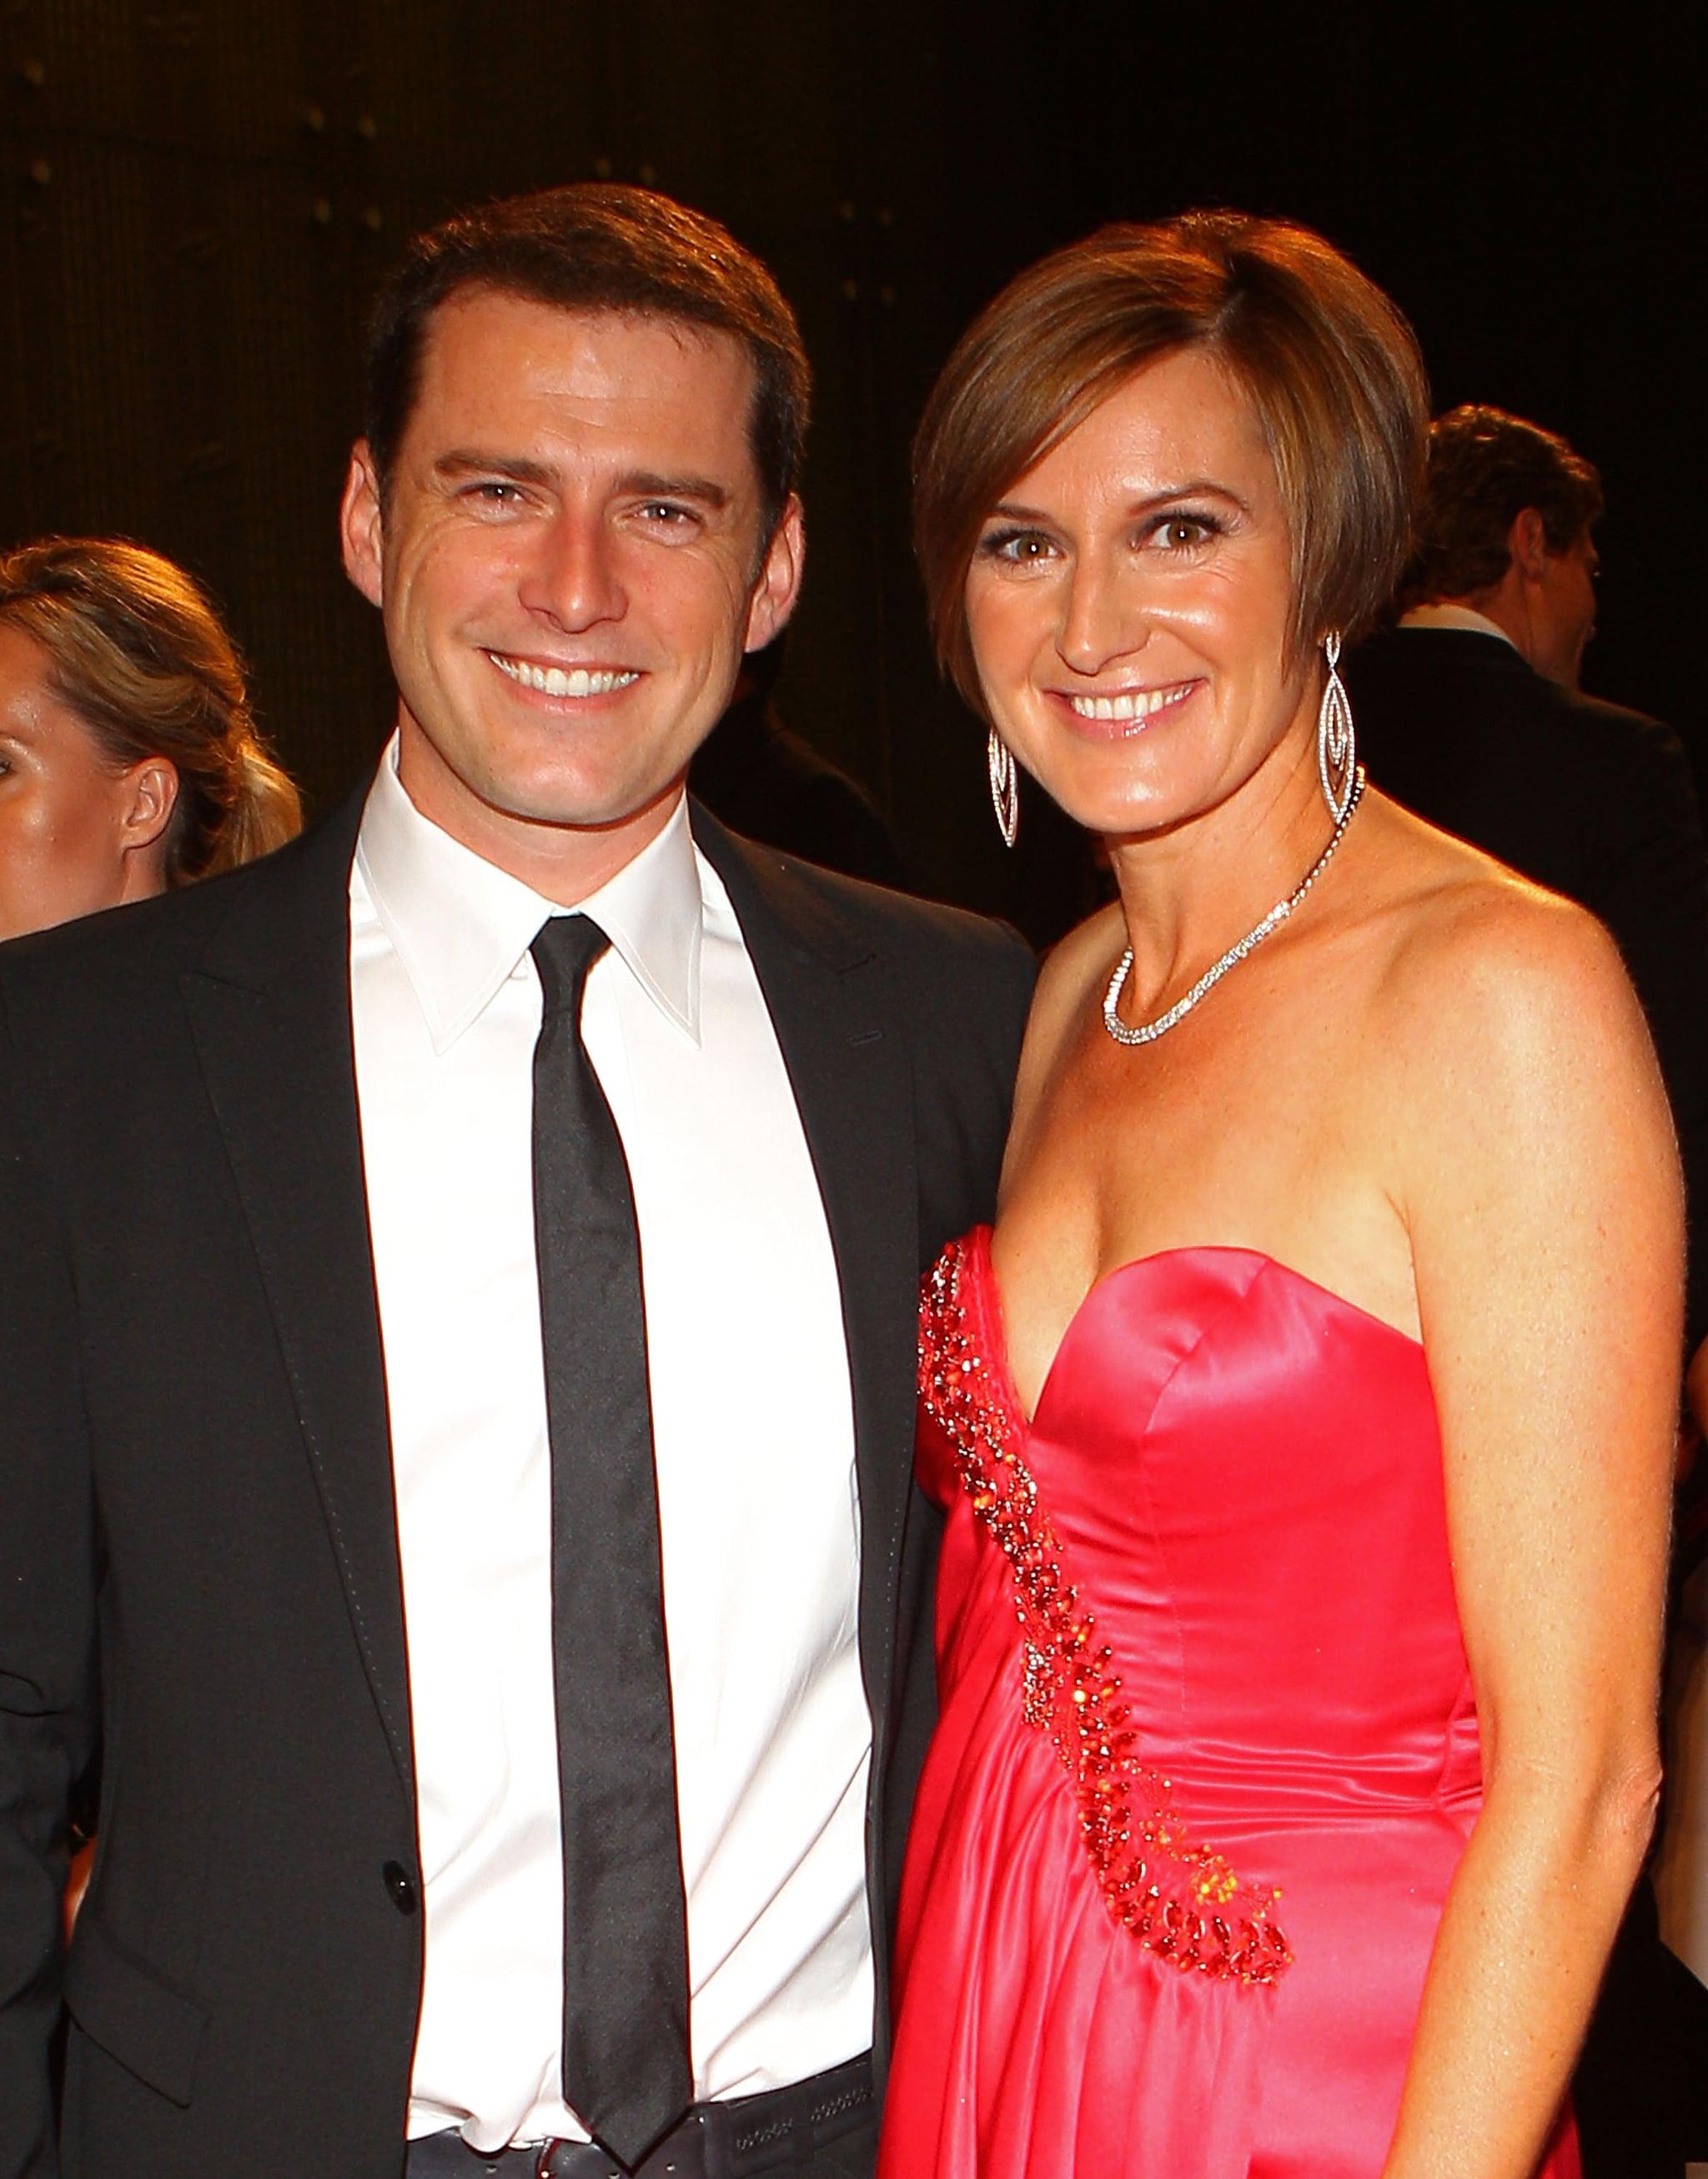 Has Karl Stefanovic Split From Wife Cassandra Thorburn